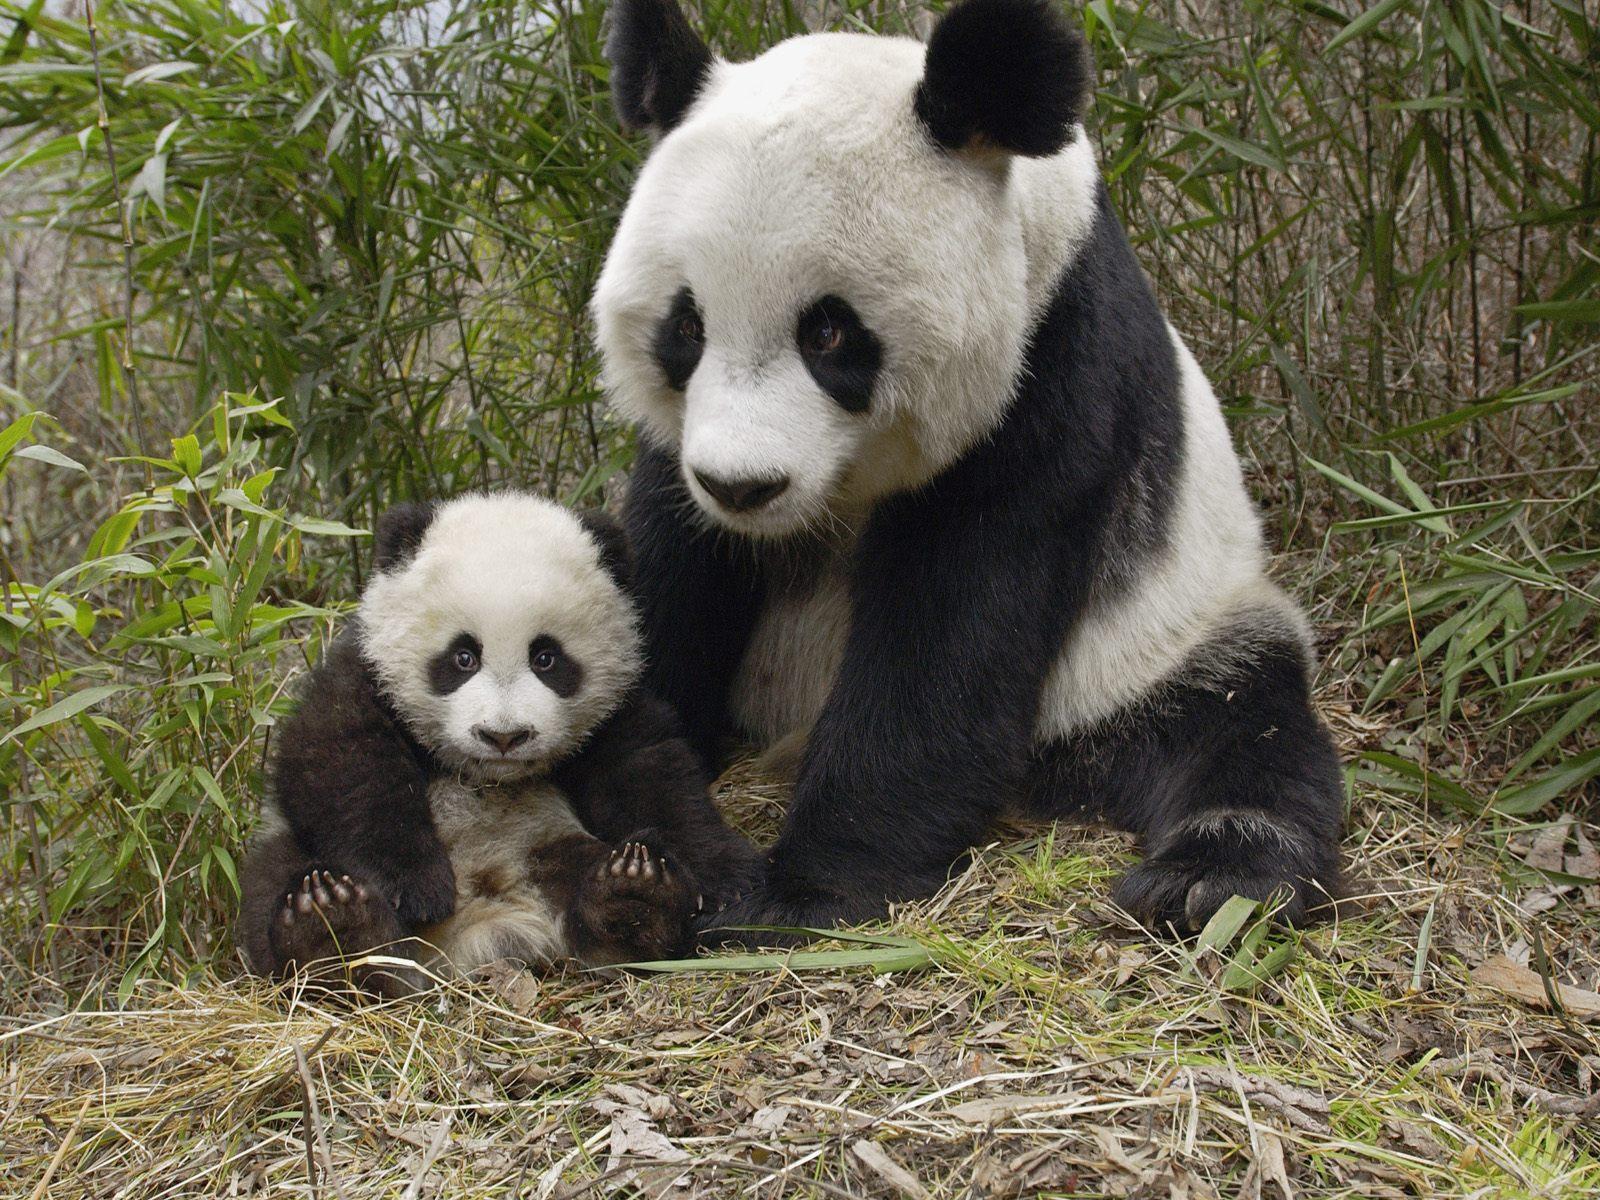 Mother and Baby Panda | Animals II | Pinterest | Pandas ...